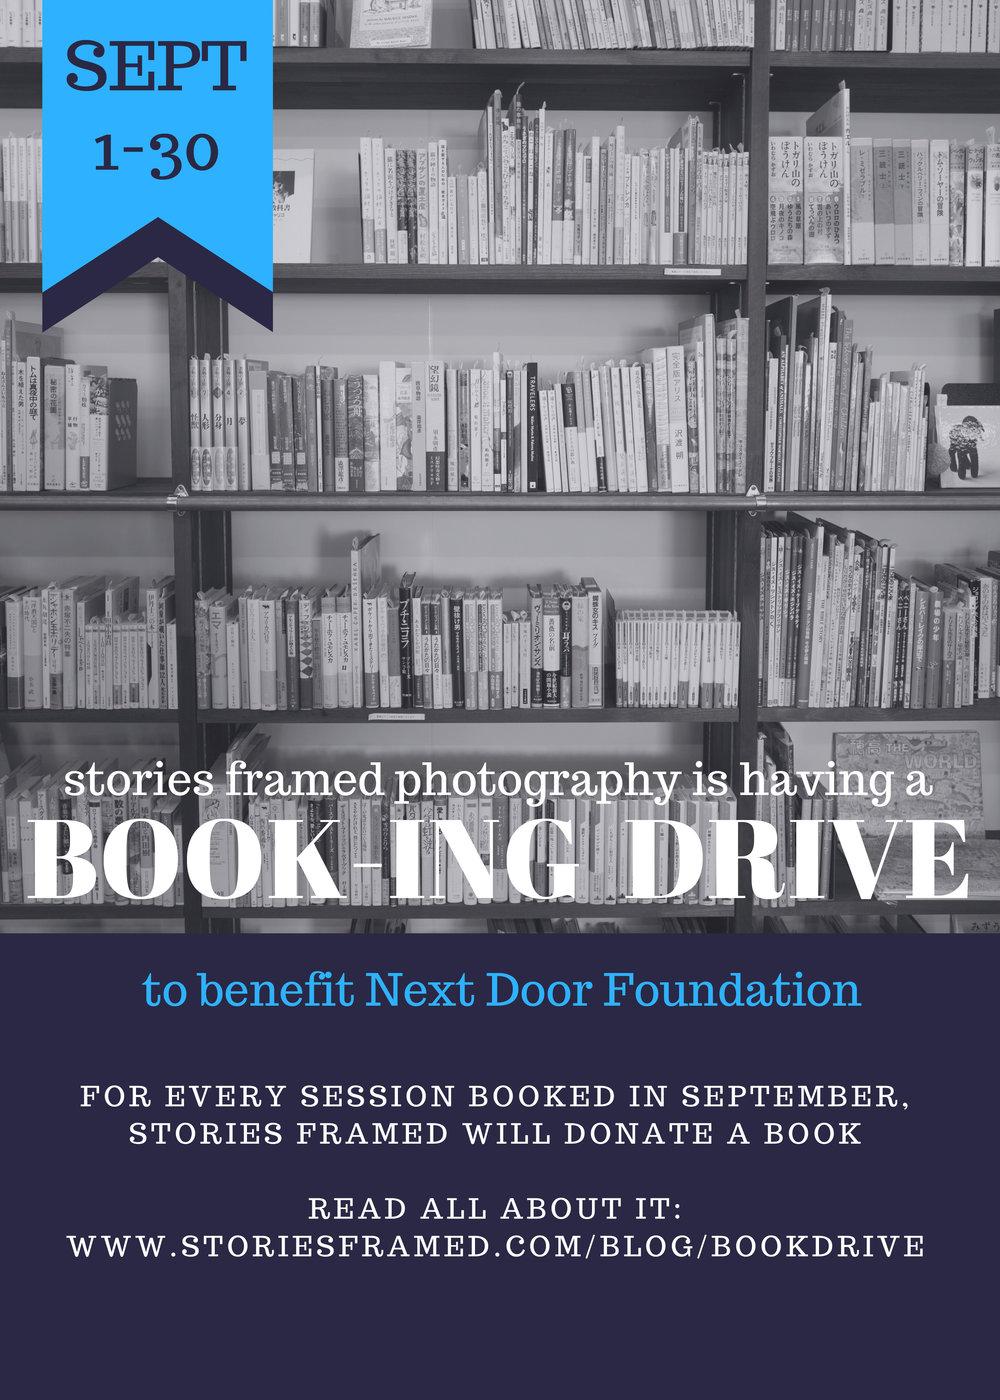 SFP Book-ing Drive 9/17